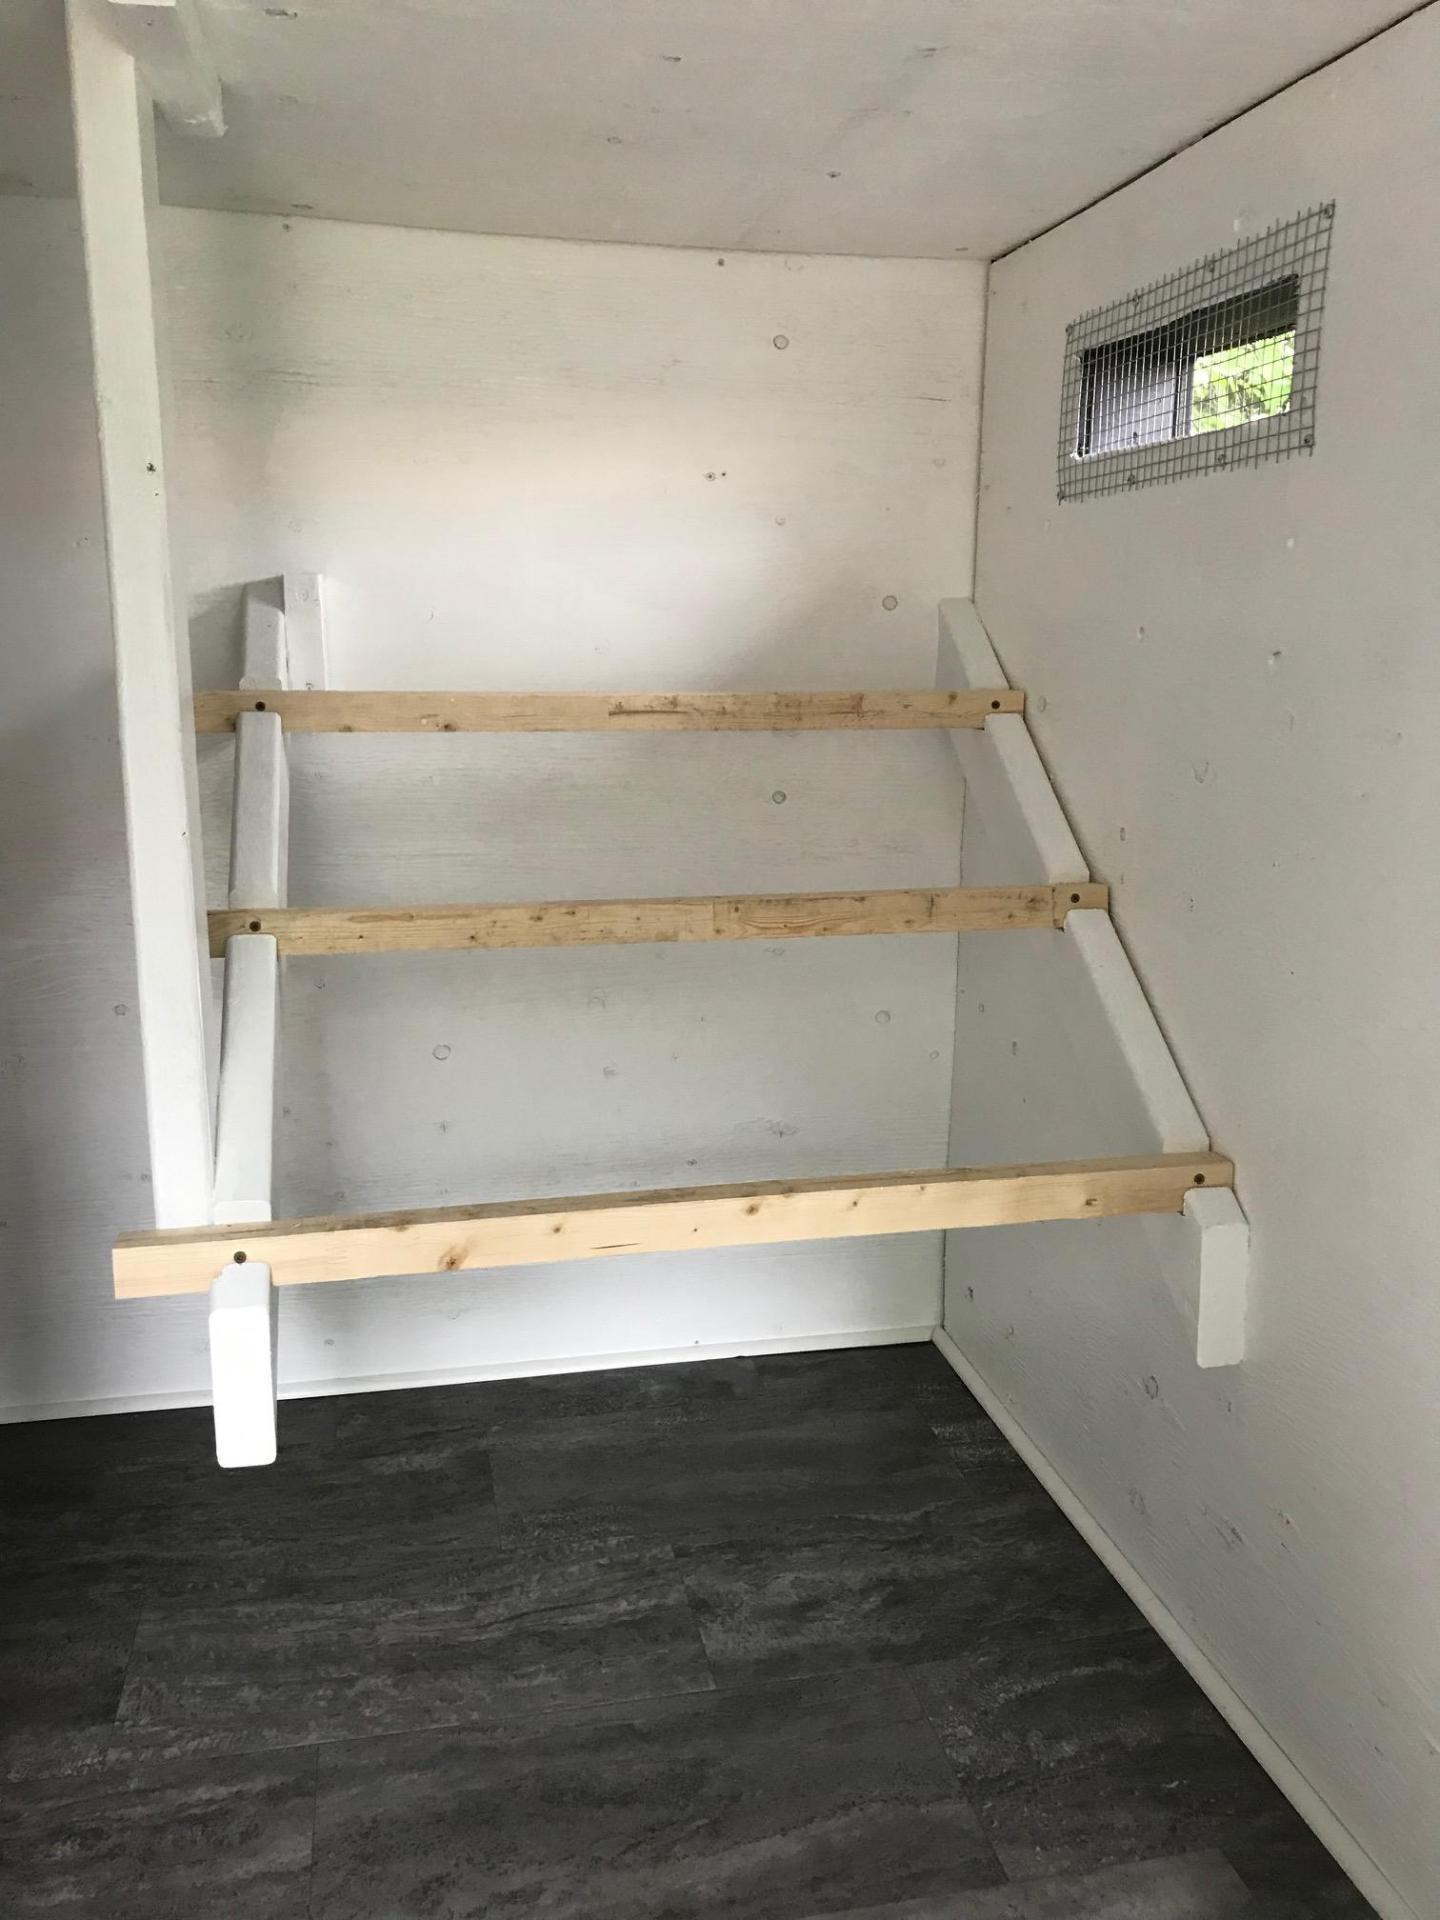 Easy Clean Coop Flooring Idea